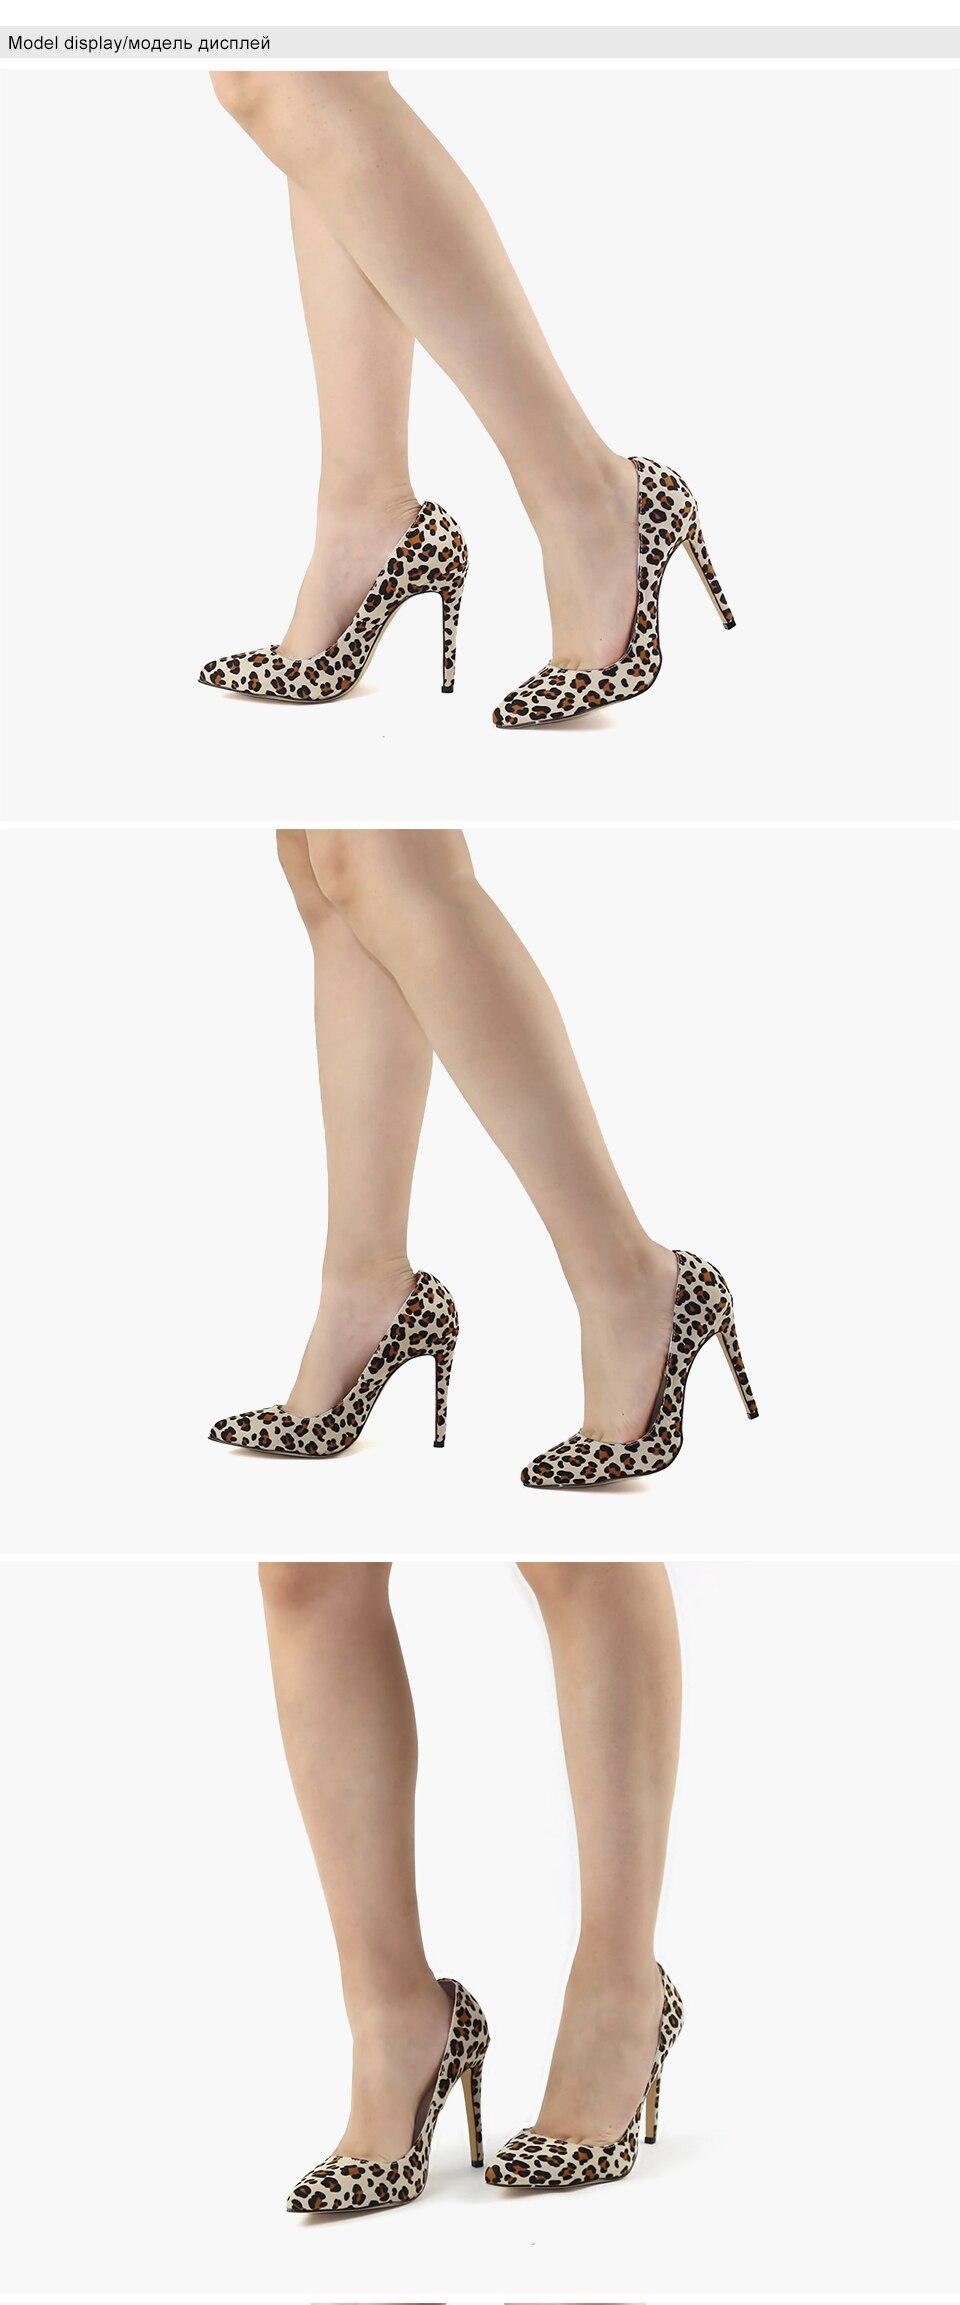 5 women high heels